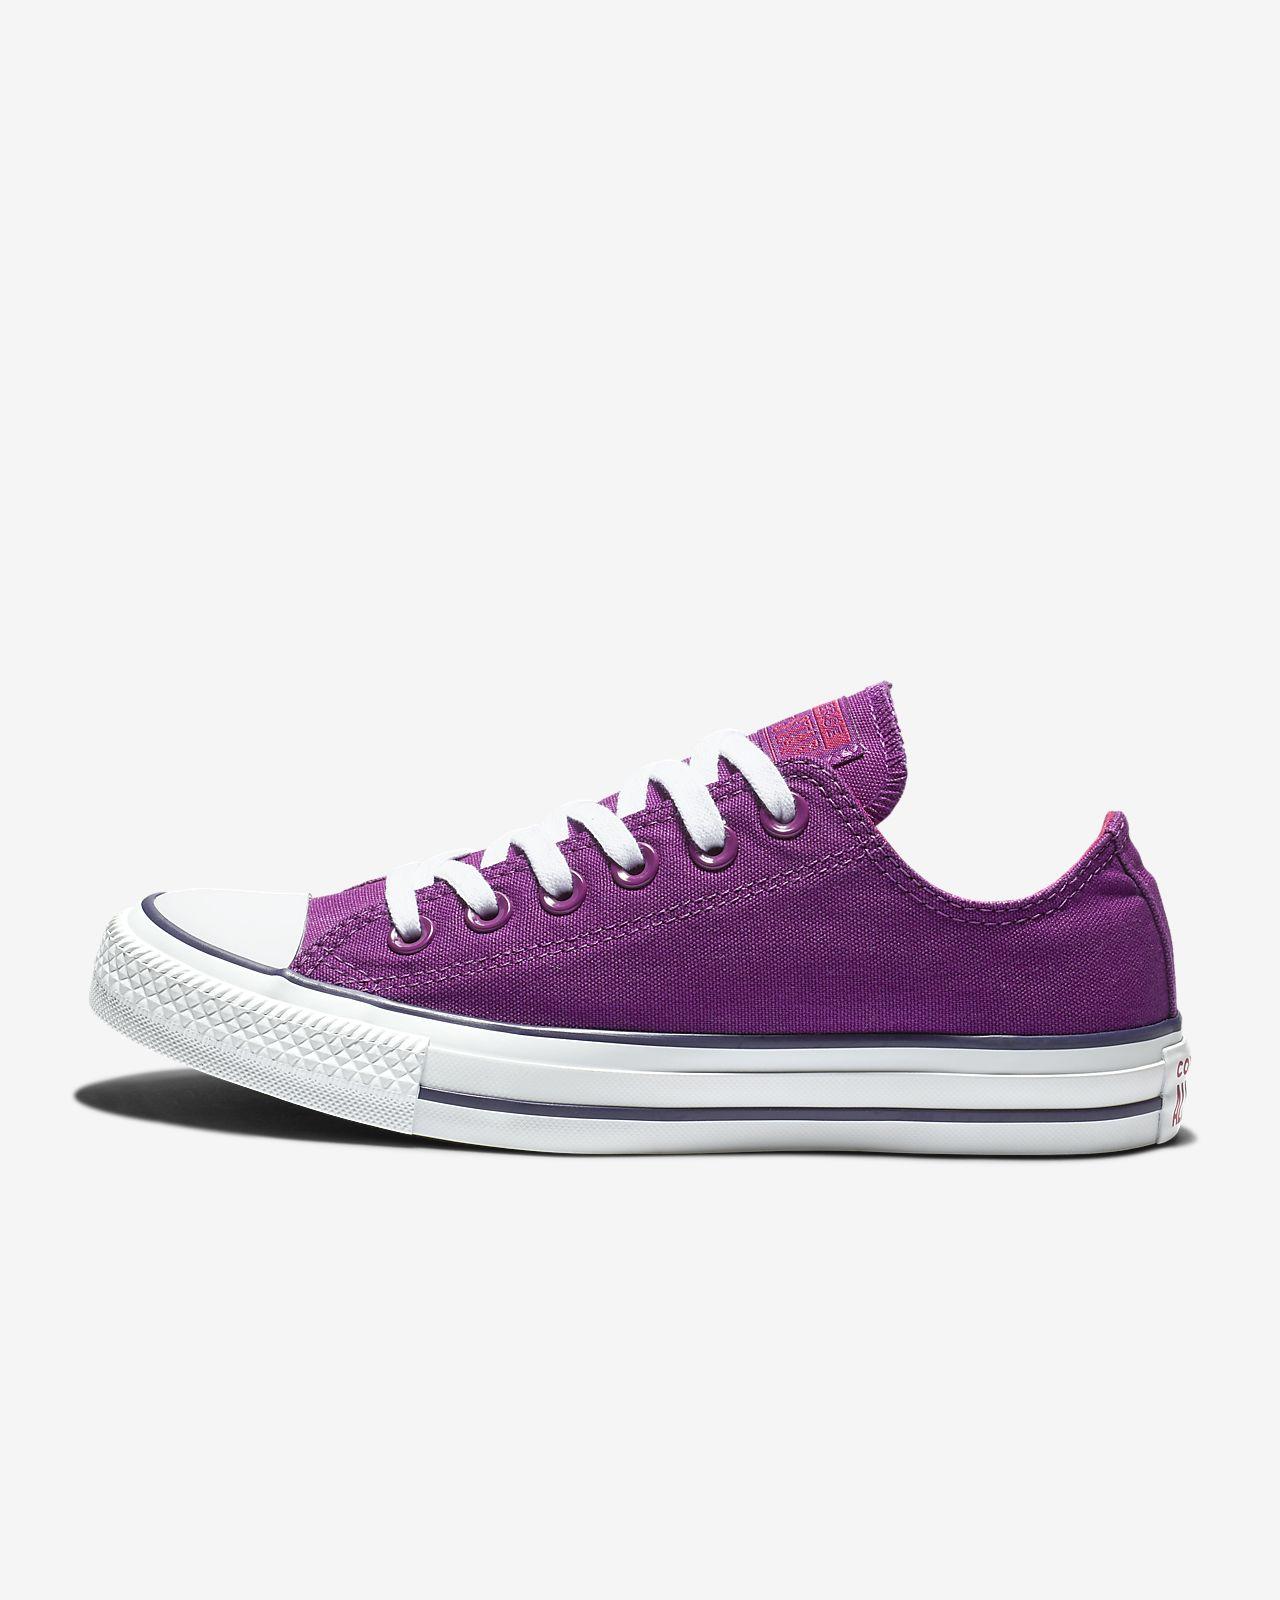 Converse Chuck Taylor All Star Seasonal Color Low Top Unisex Shoe